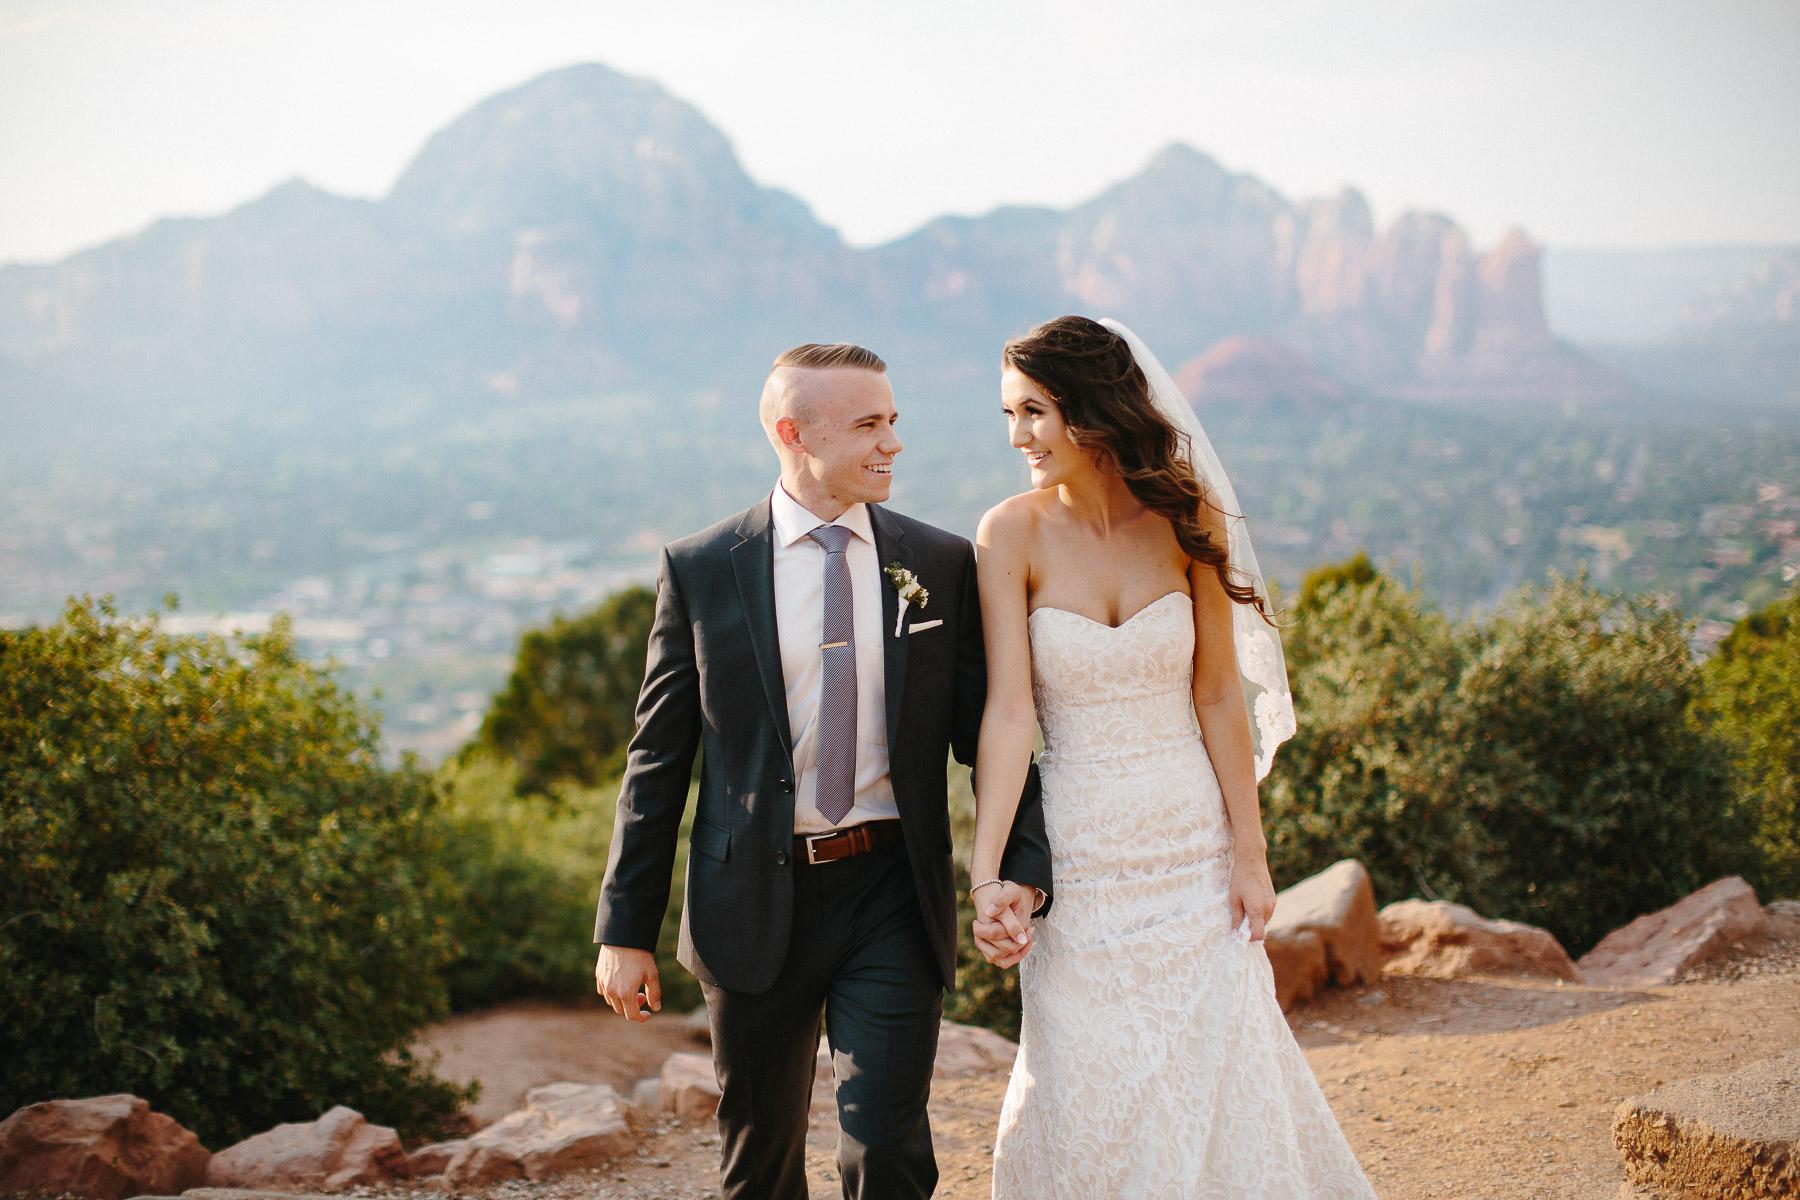 170528-Malkin-Wedding-Sedona-Arizona-Wedding-Photography-Sky-Ranch-Lodge-1036.jpg